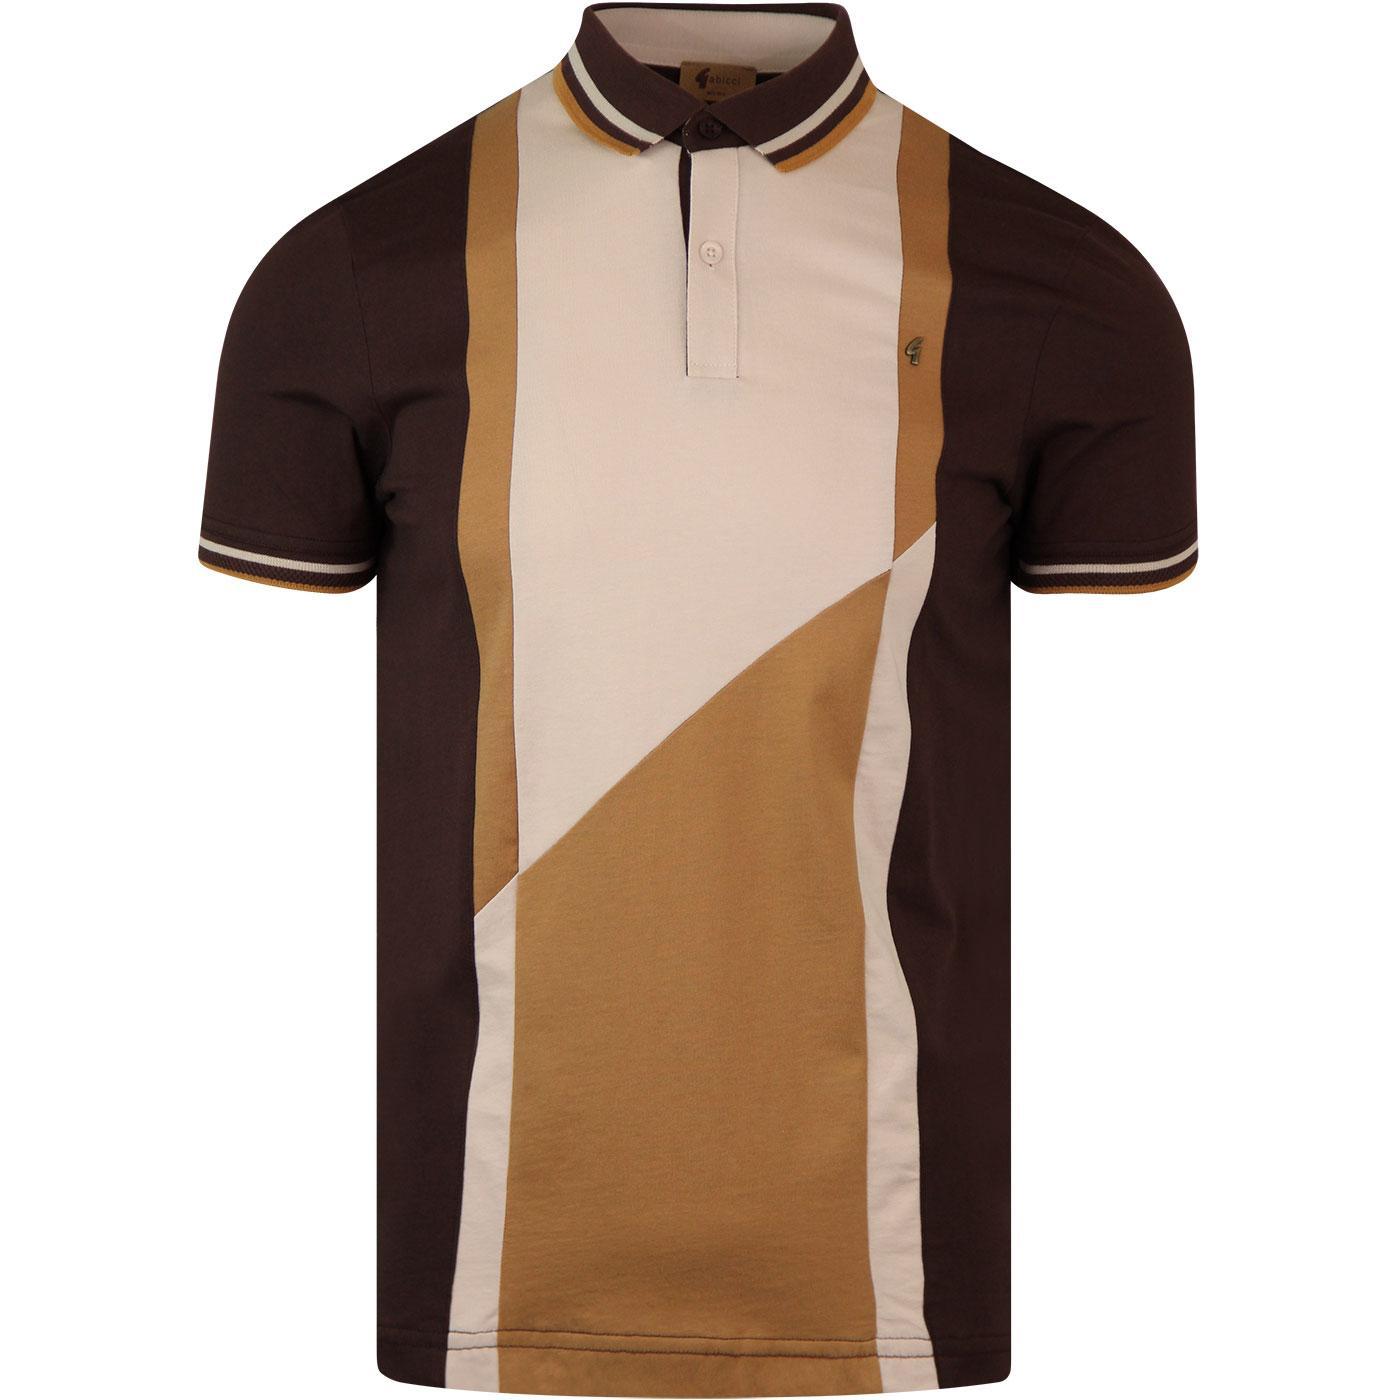 Brace GABICCI VINTAGE Retro 70s Mod Polo Shirt